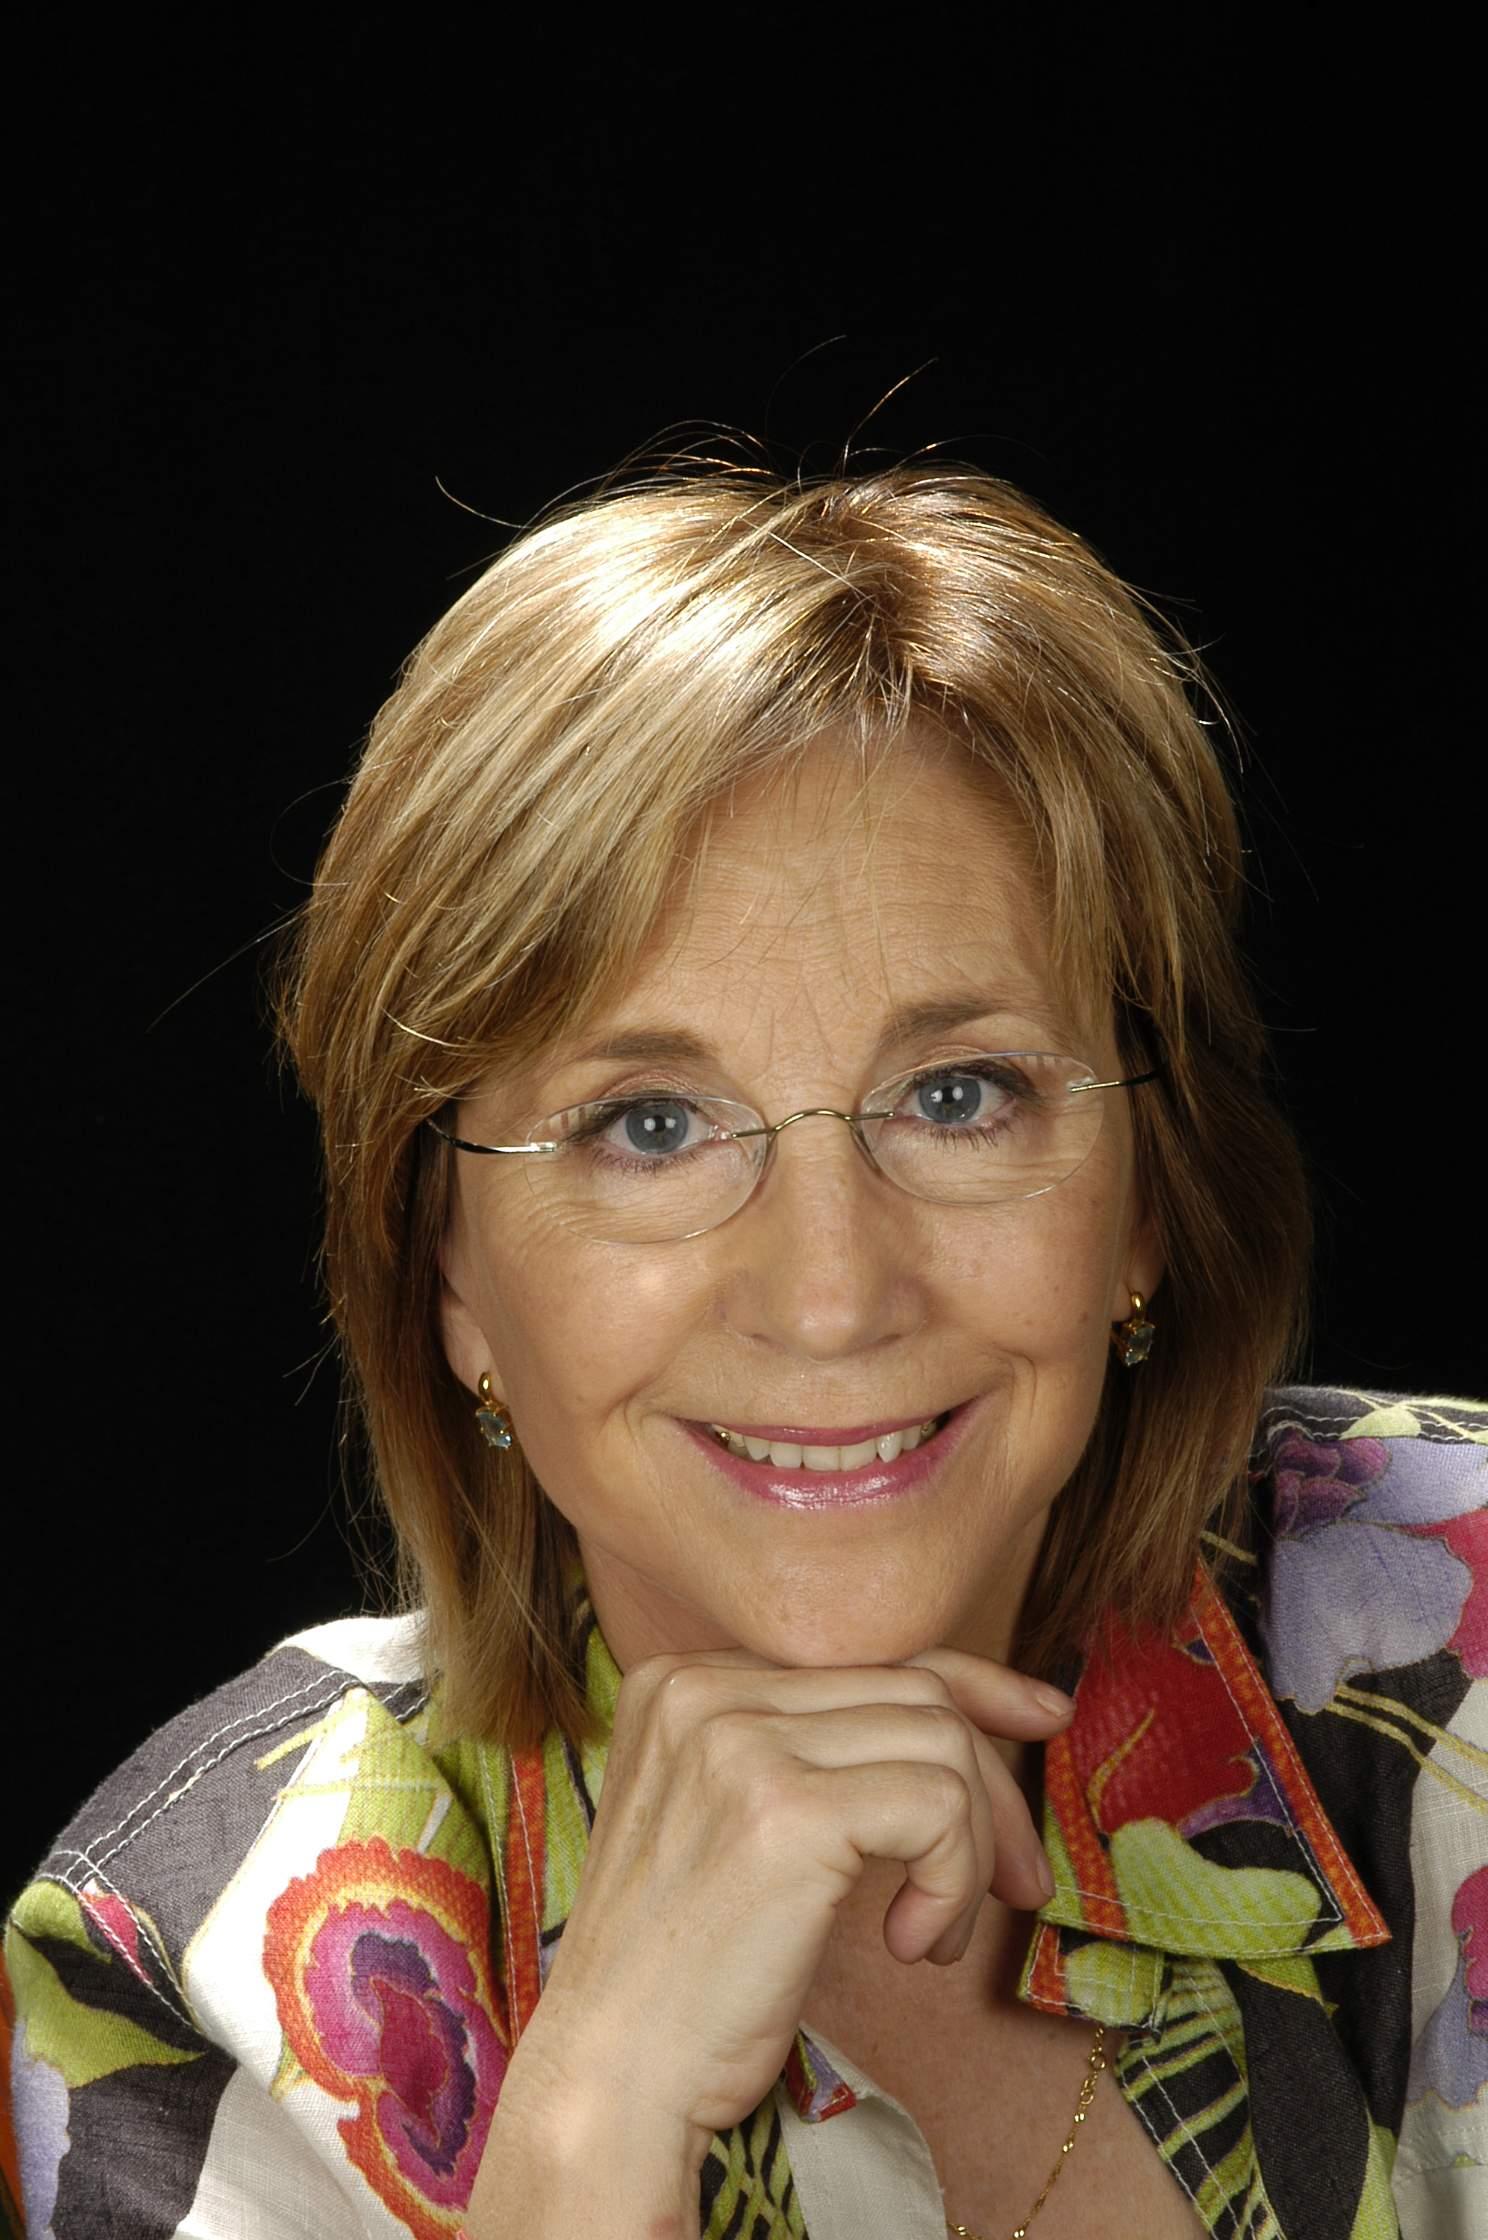 Sra. Mª Teresa García Manzanares